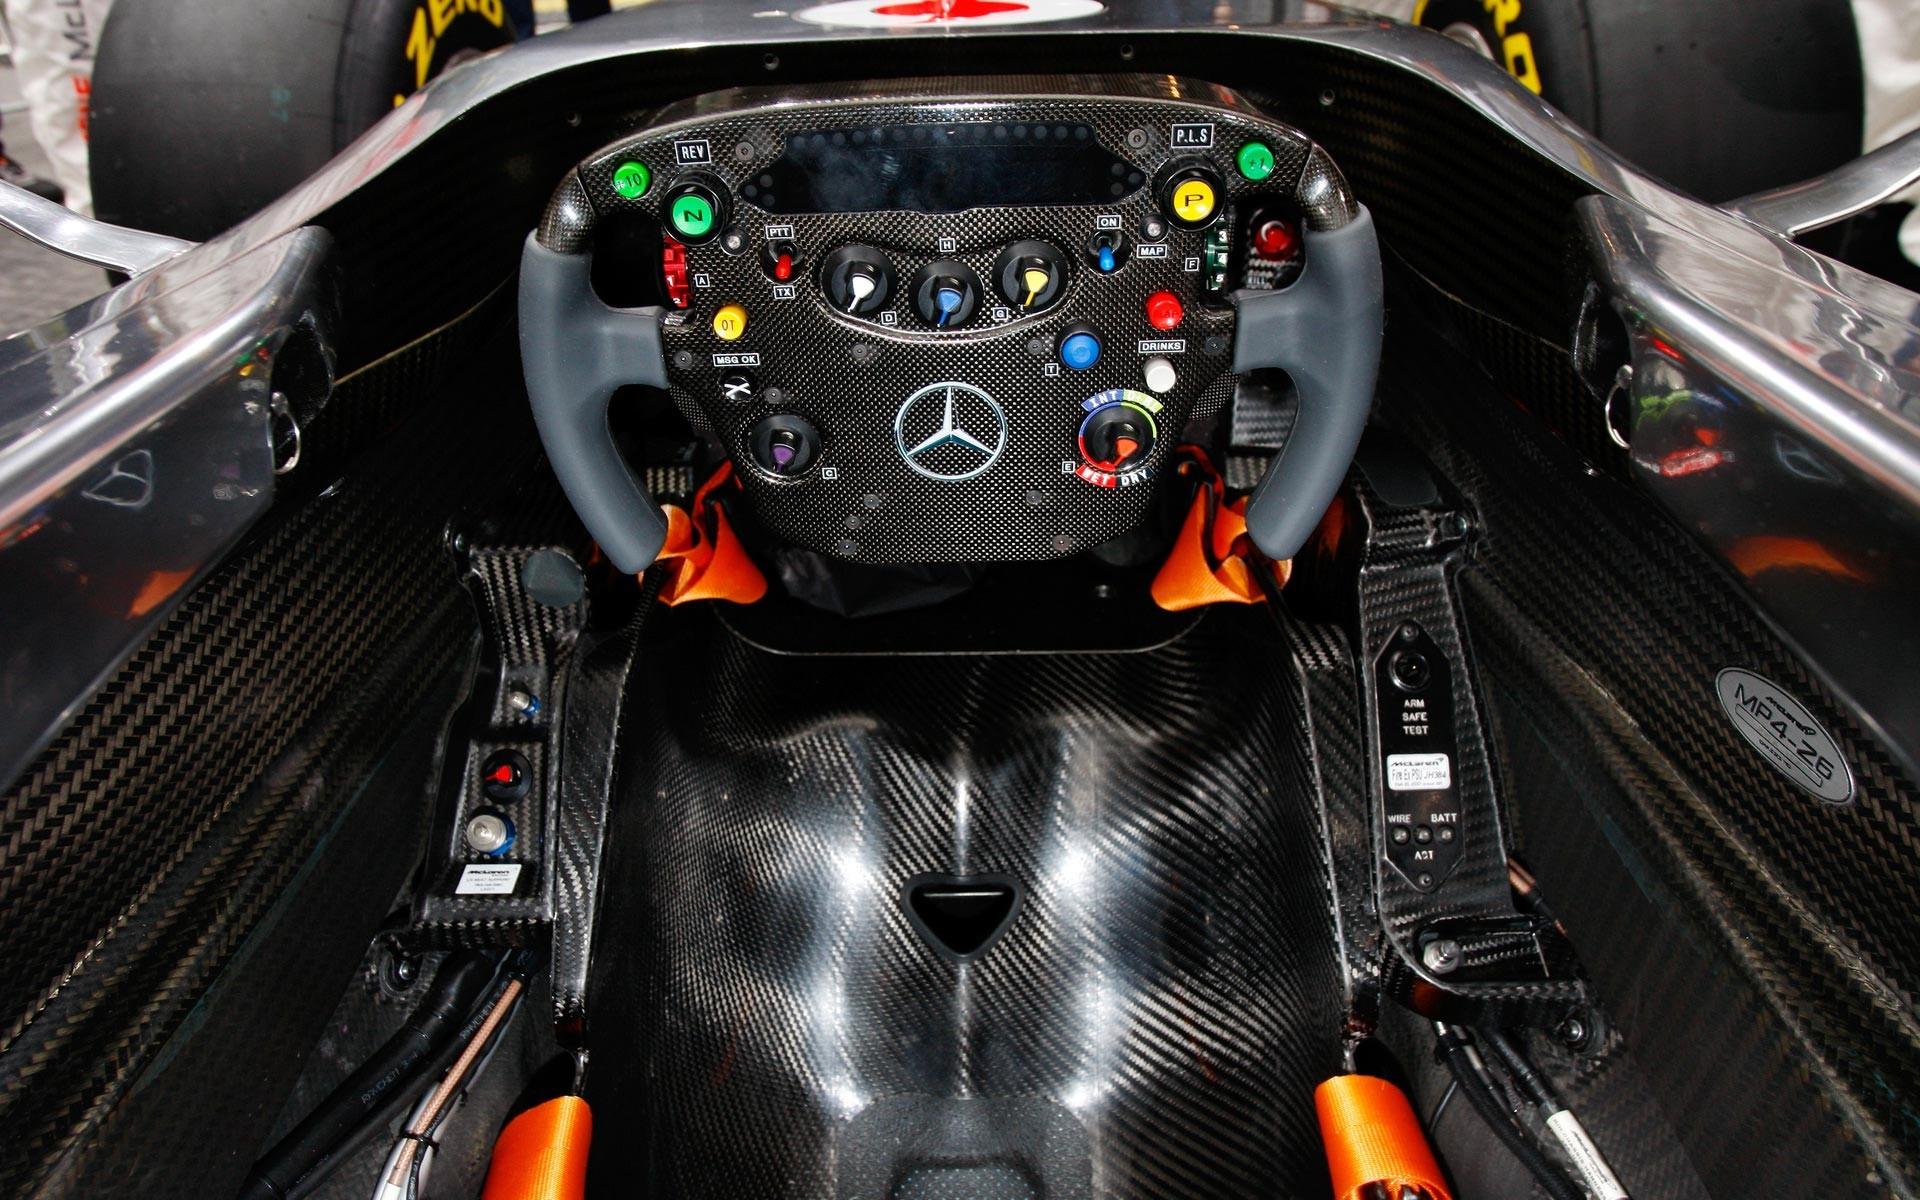 F1-Car-Cockpit-WideScreen-s b0176f4ce9cfd9ba1b59f786a1d795df …